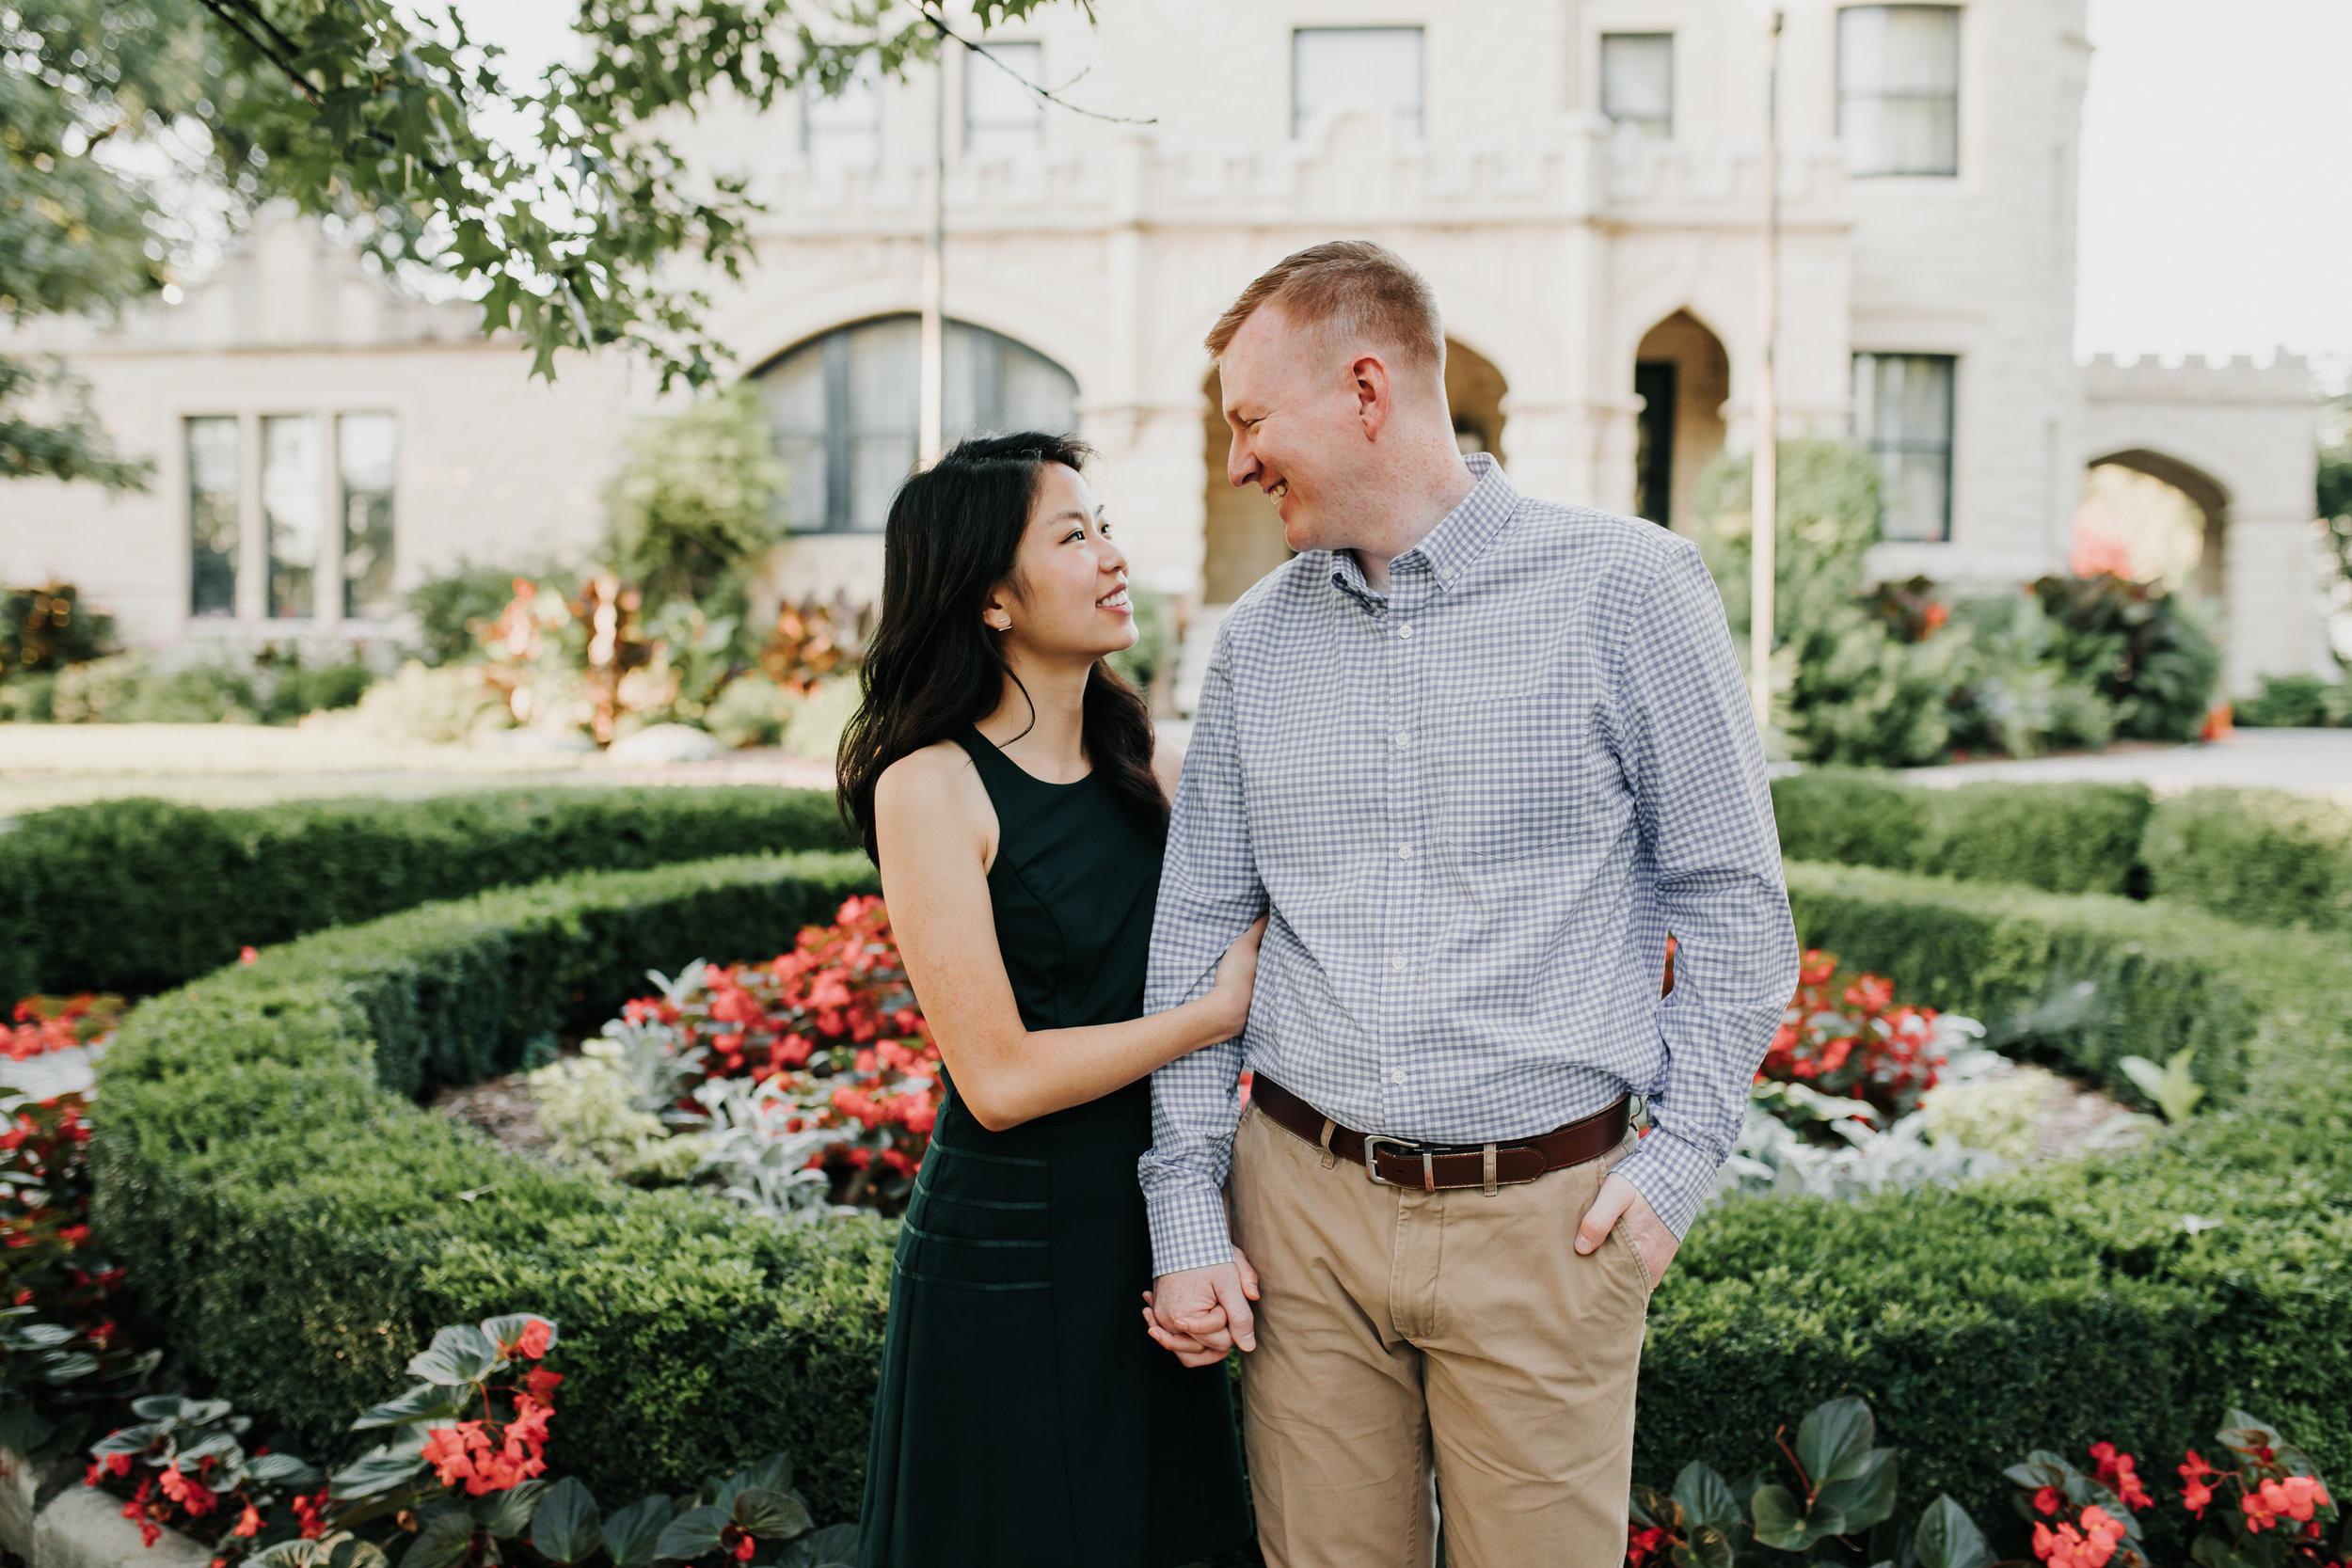 Catherin & Kyle - Married - Nathaniel Jensen Photography - Omaha Nebraska Wedding Photograper - Memorial Park - Joslyn Castle Engagement Session-51.jpg